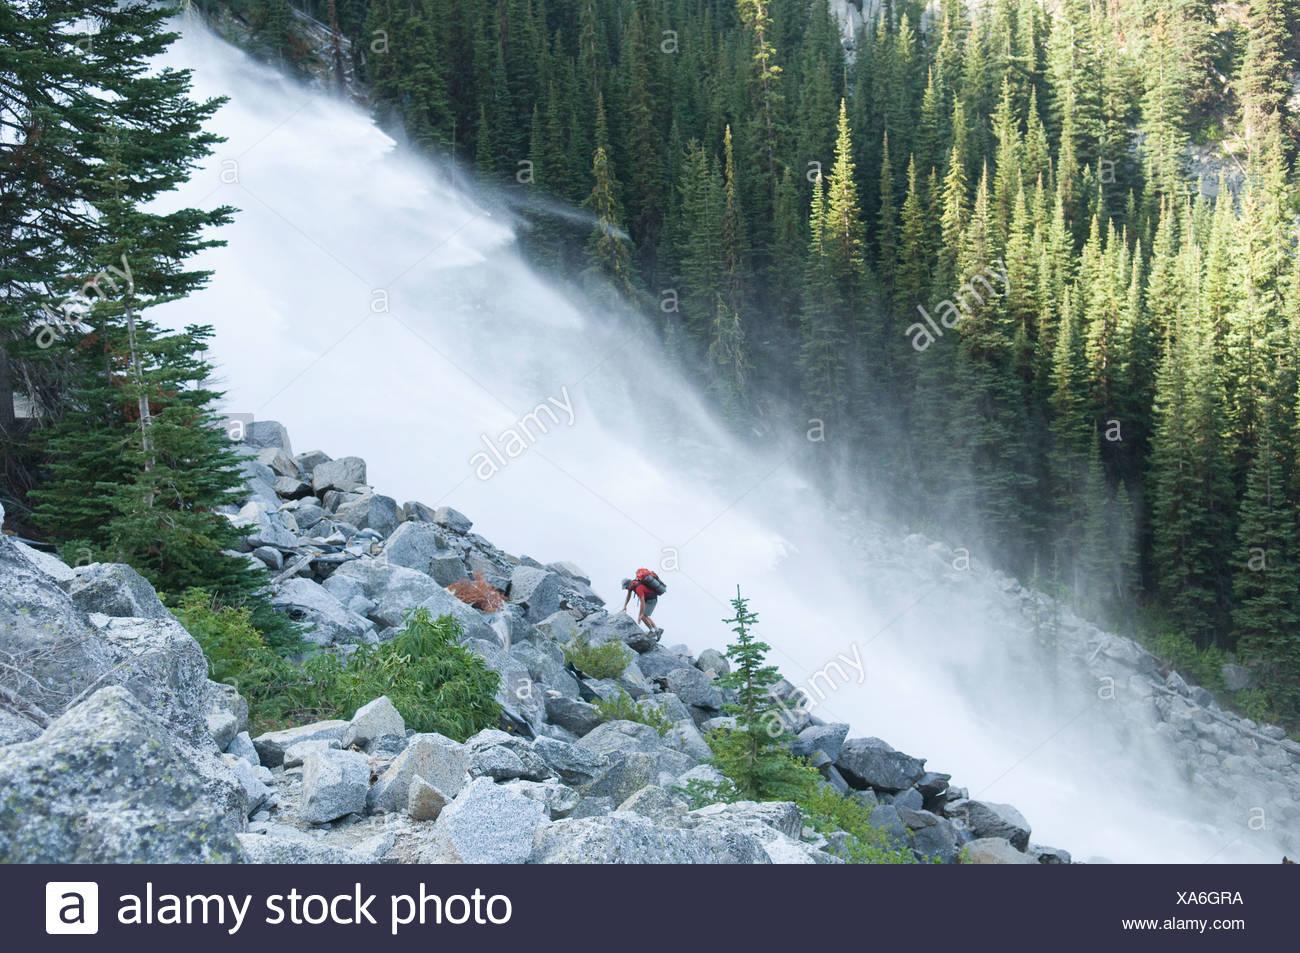 A man hiking next to waterfall, Enchantment Peaks, Alpine Lakes Wilderness, Leavenworth, Washington. - Stock Image